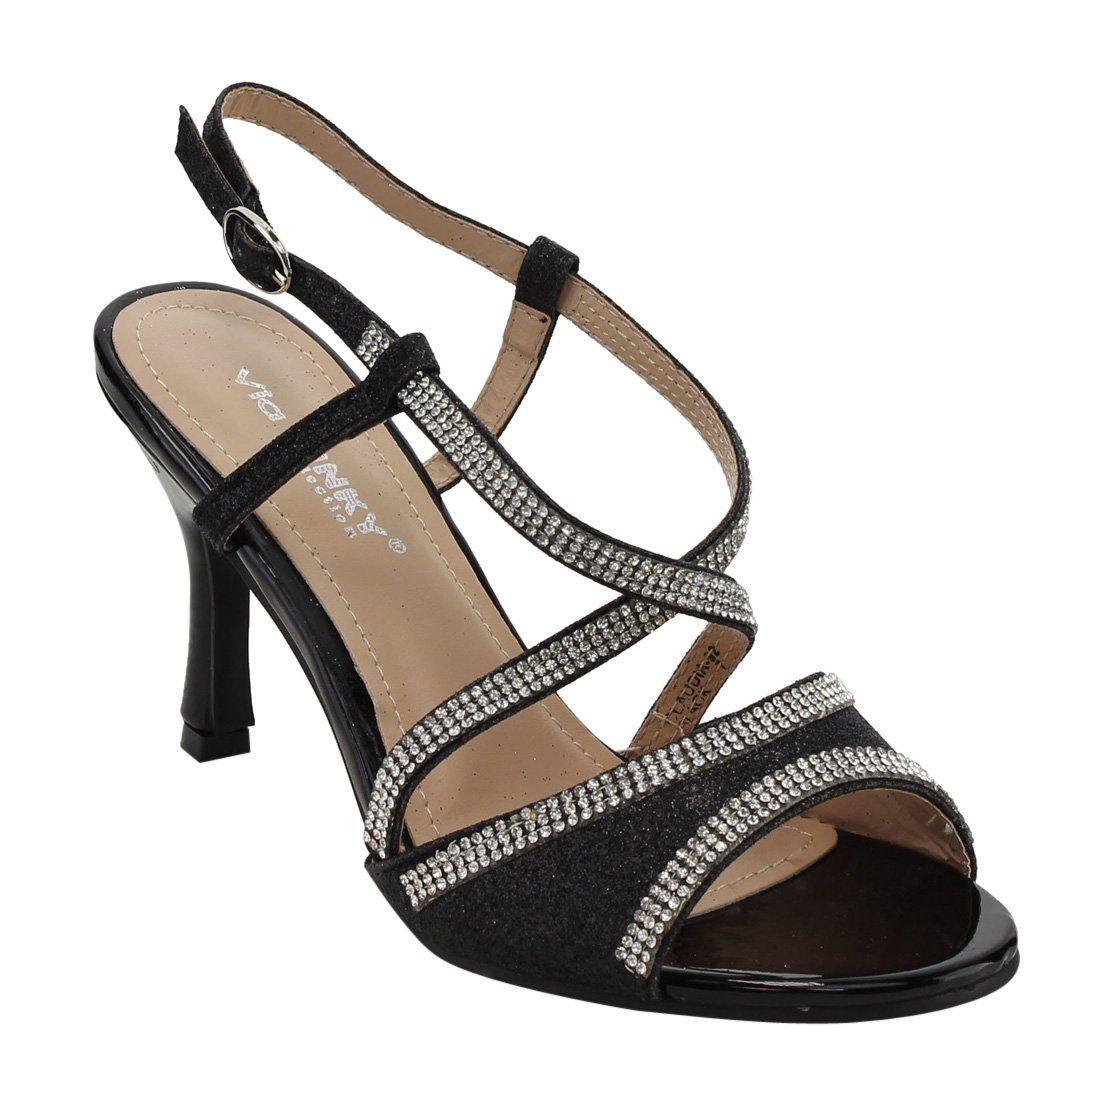 Via Pinky Eg79 Women S Rhinestone Criss Cross Kitten Heel Sandals One Size Small Very Nice Of You To Drop By Kitten Heel Sandals Sandals Heels Kitten Heels